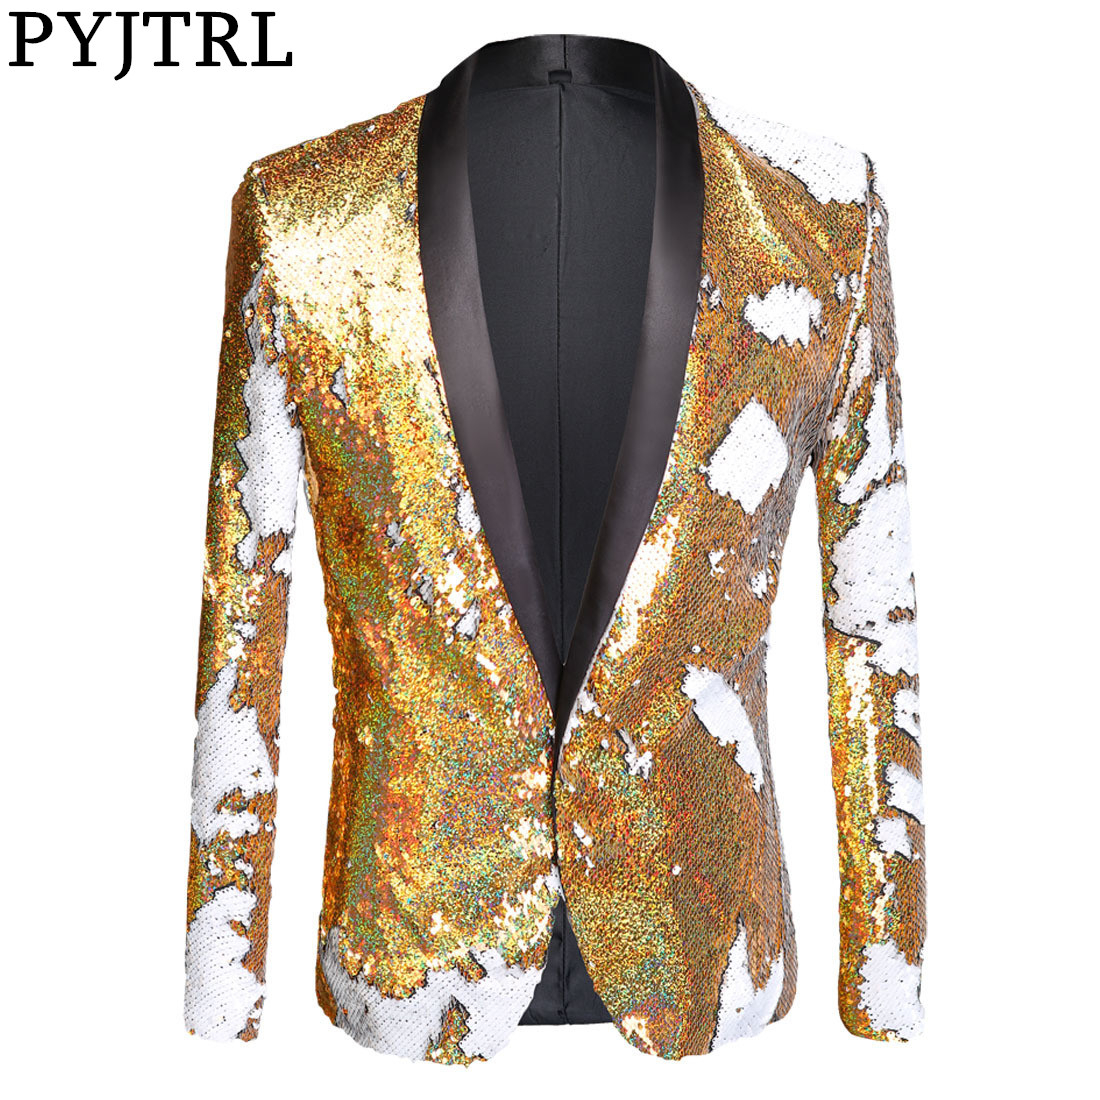 PYJTRL Full Sequins Series Men Double-Color Gold White Sequins Blazer Fashion Punk Nightclub Bar DJ Singers Suit Jacket Costumes